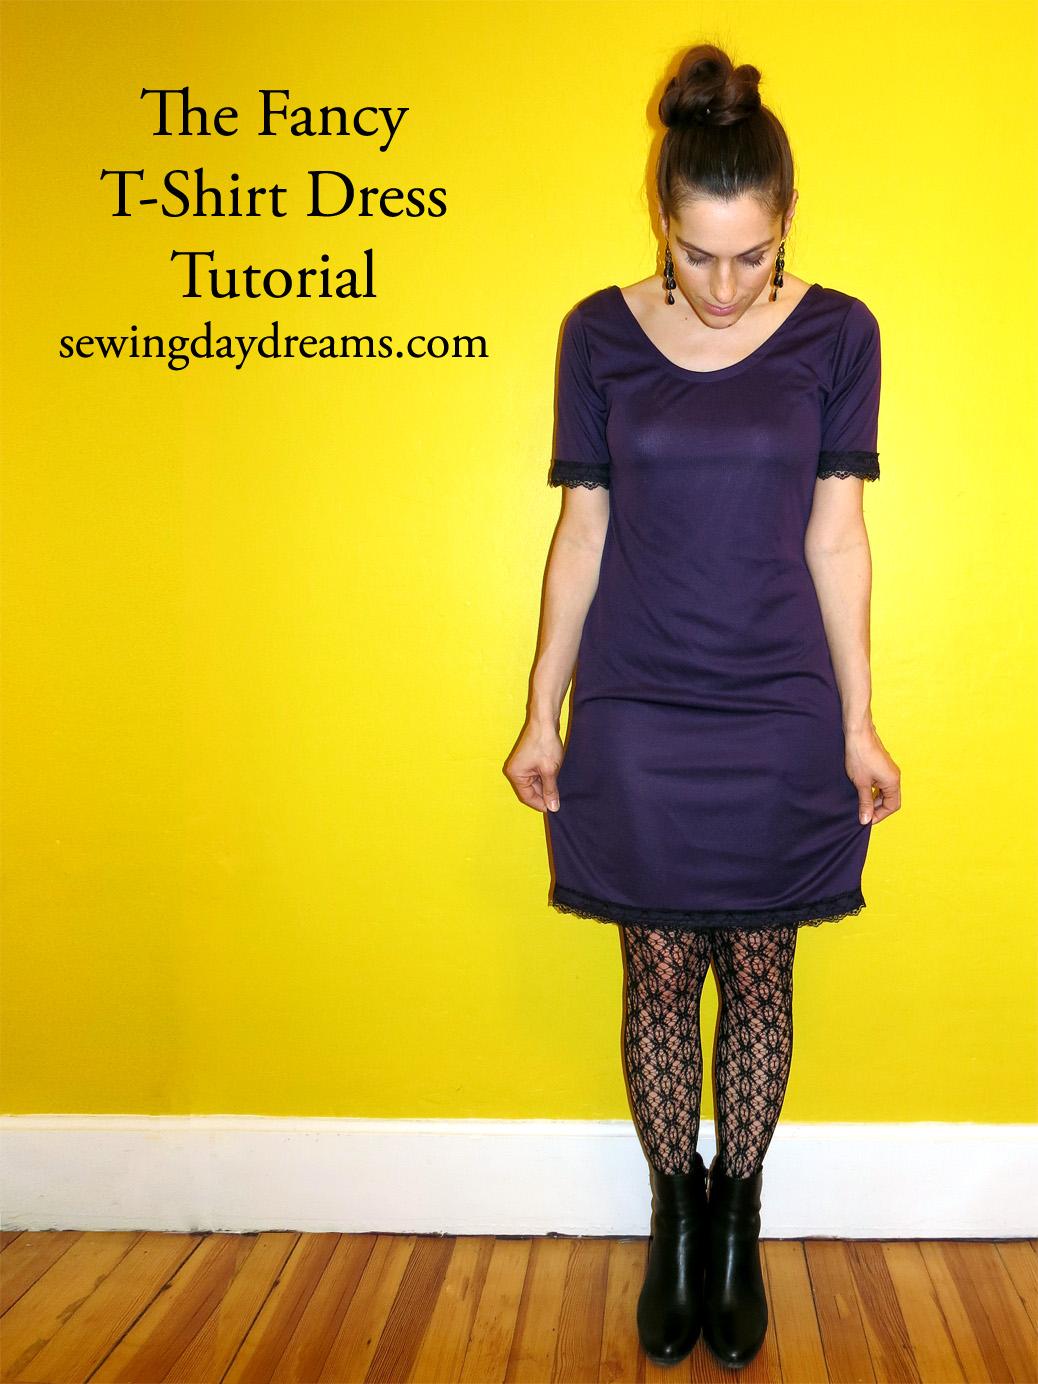 DIY - The Fancy T-Shirt Dress Tutorial | Sewing Daydreams